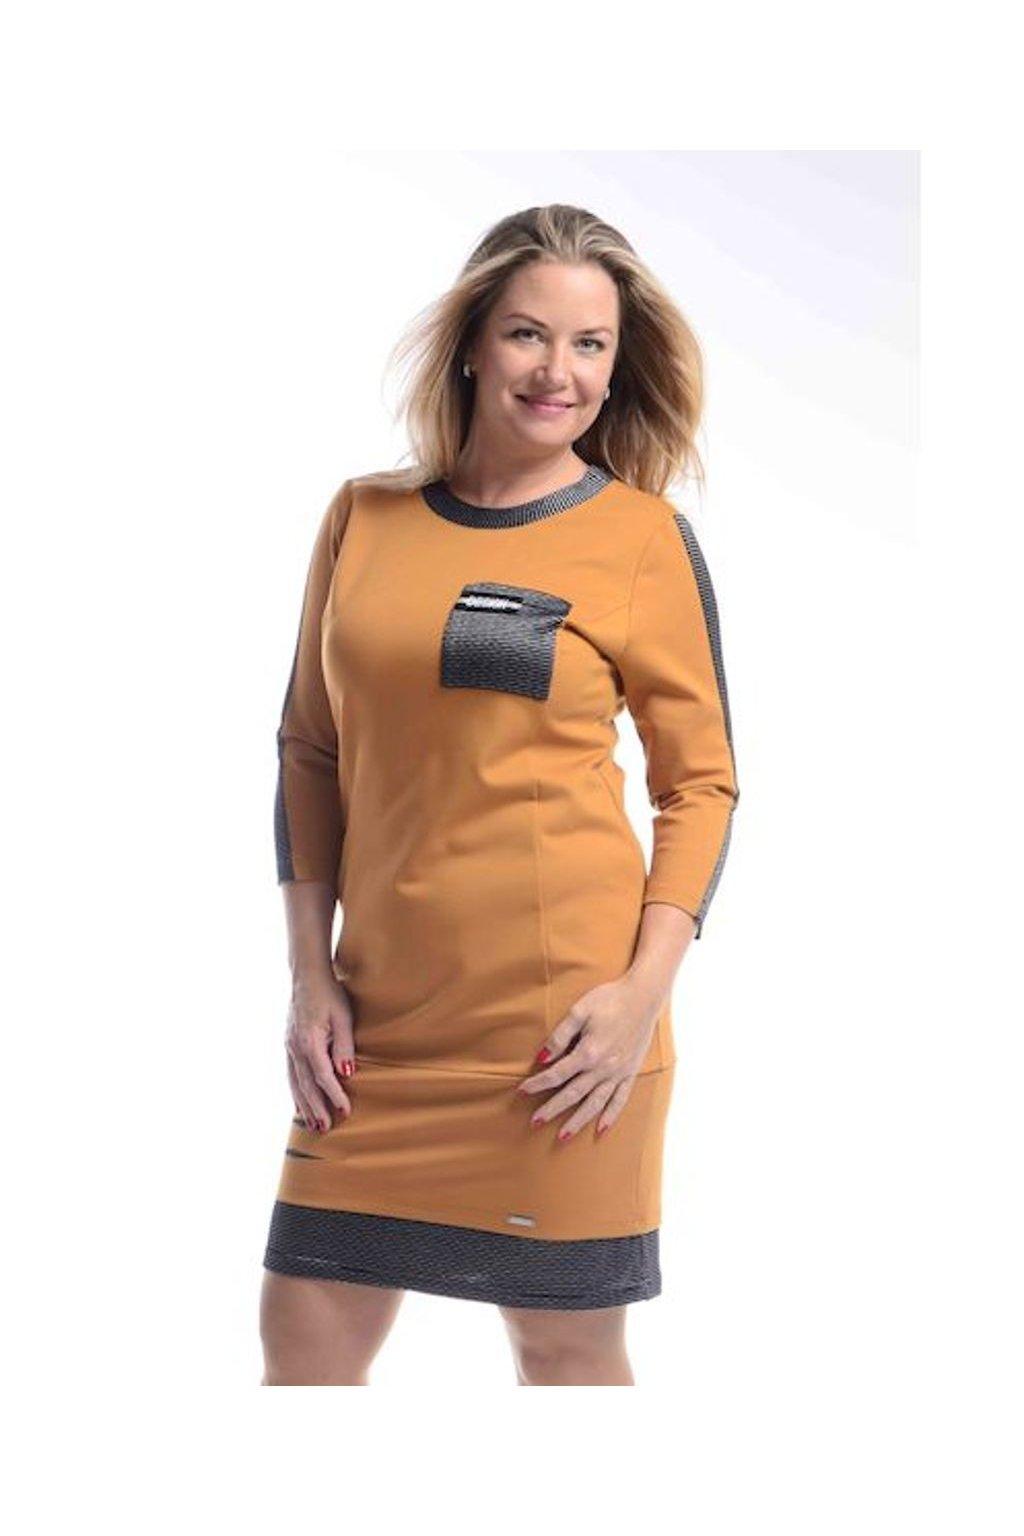 8620 Šaty Design (Velikost 36, Barva Cihlová)